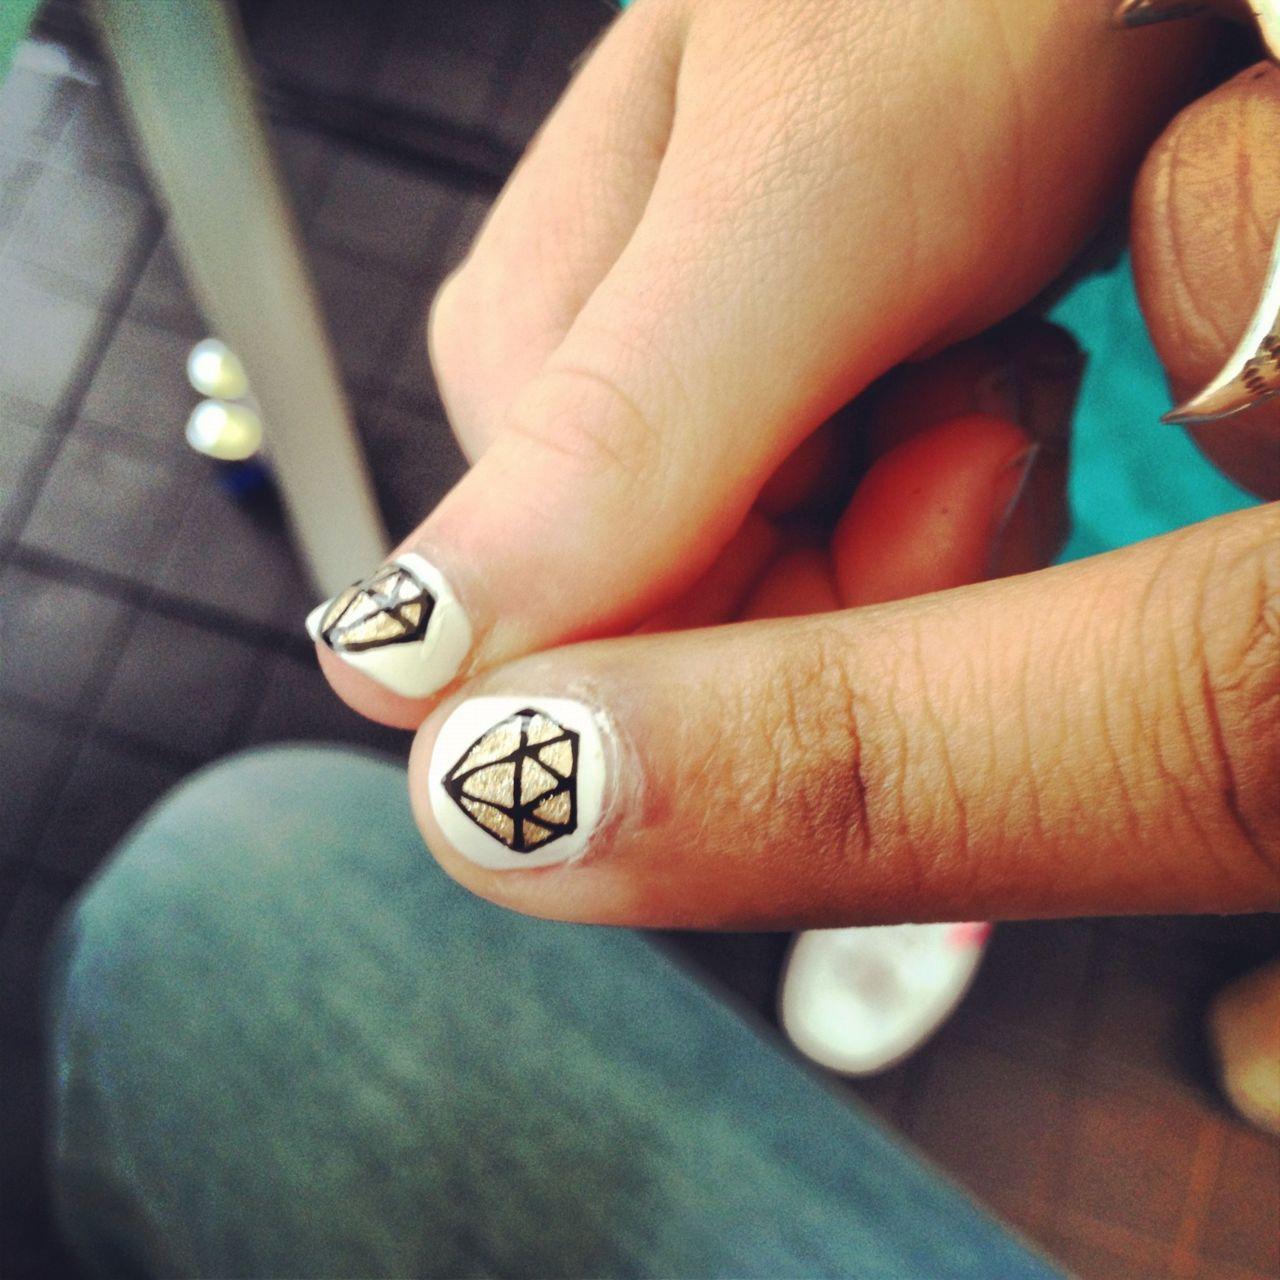 The Illustrated Nail - diamond nail art | Uñas uno | Pinterest ...